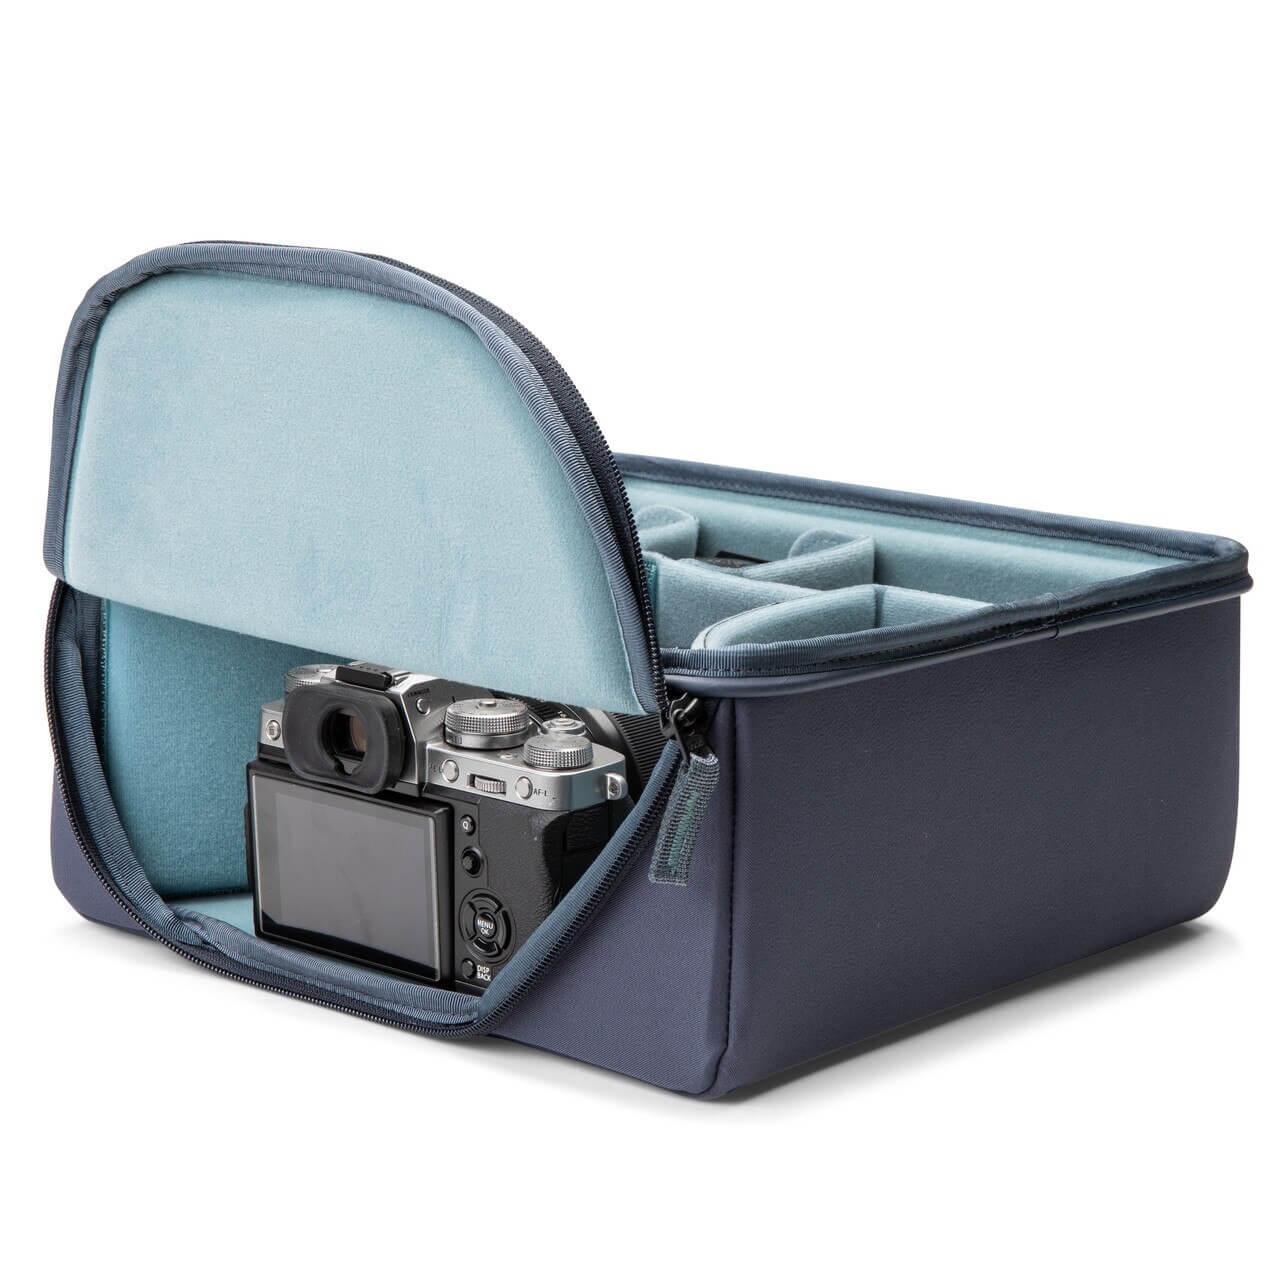 Shimoda Designs Medium Mirrorless Core Unit Version 2 Parisian Nights 3